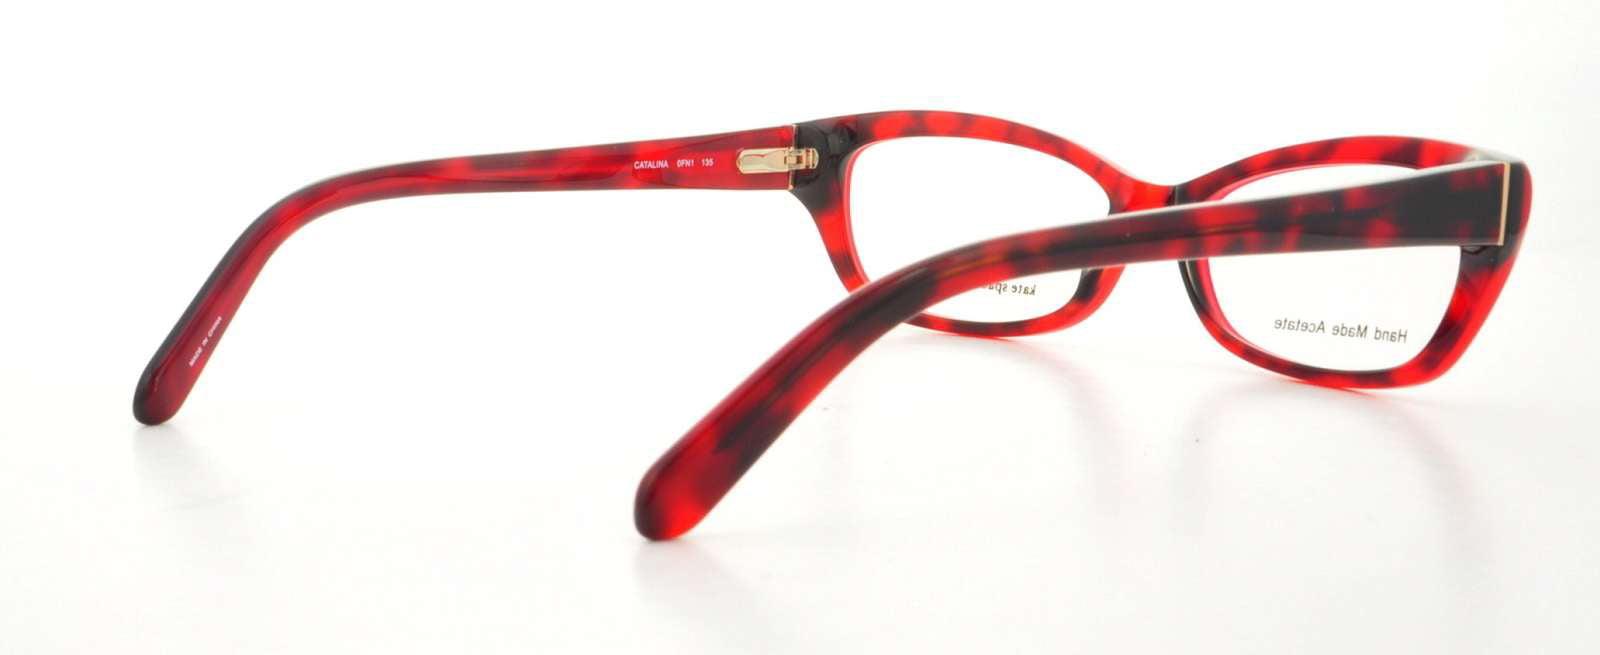 3c180f28fd4 KATE SPADE Eyeglasses CATALINA 0FN1 Red Havana 51MM - Walmart.com